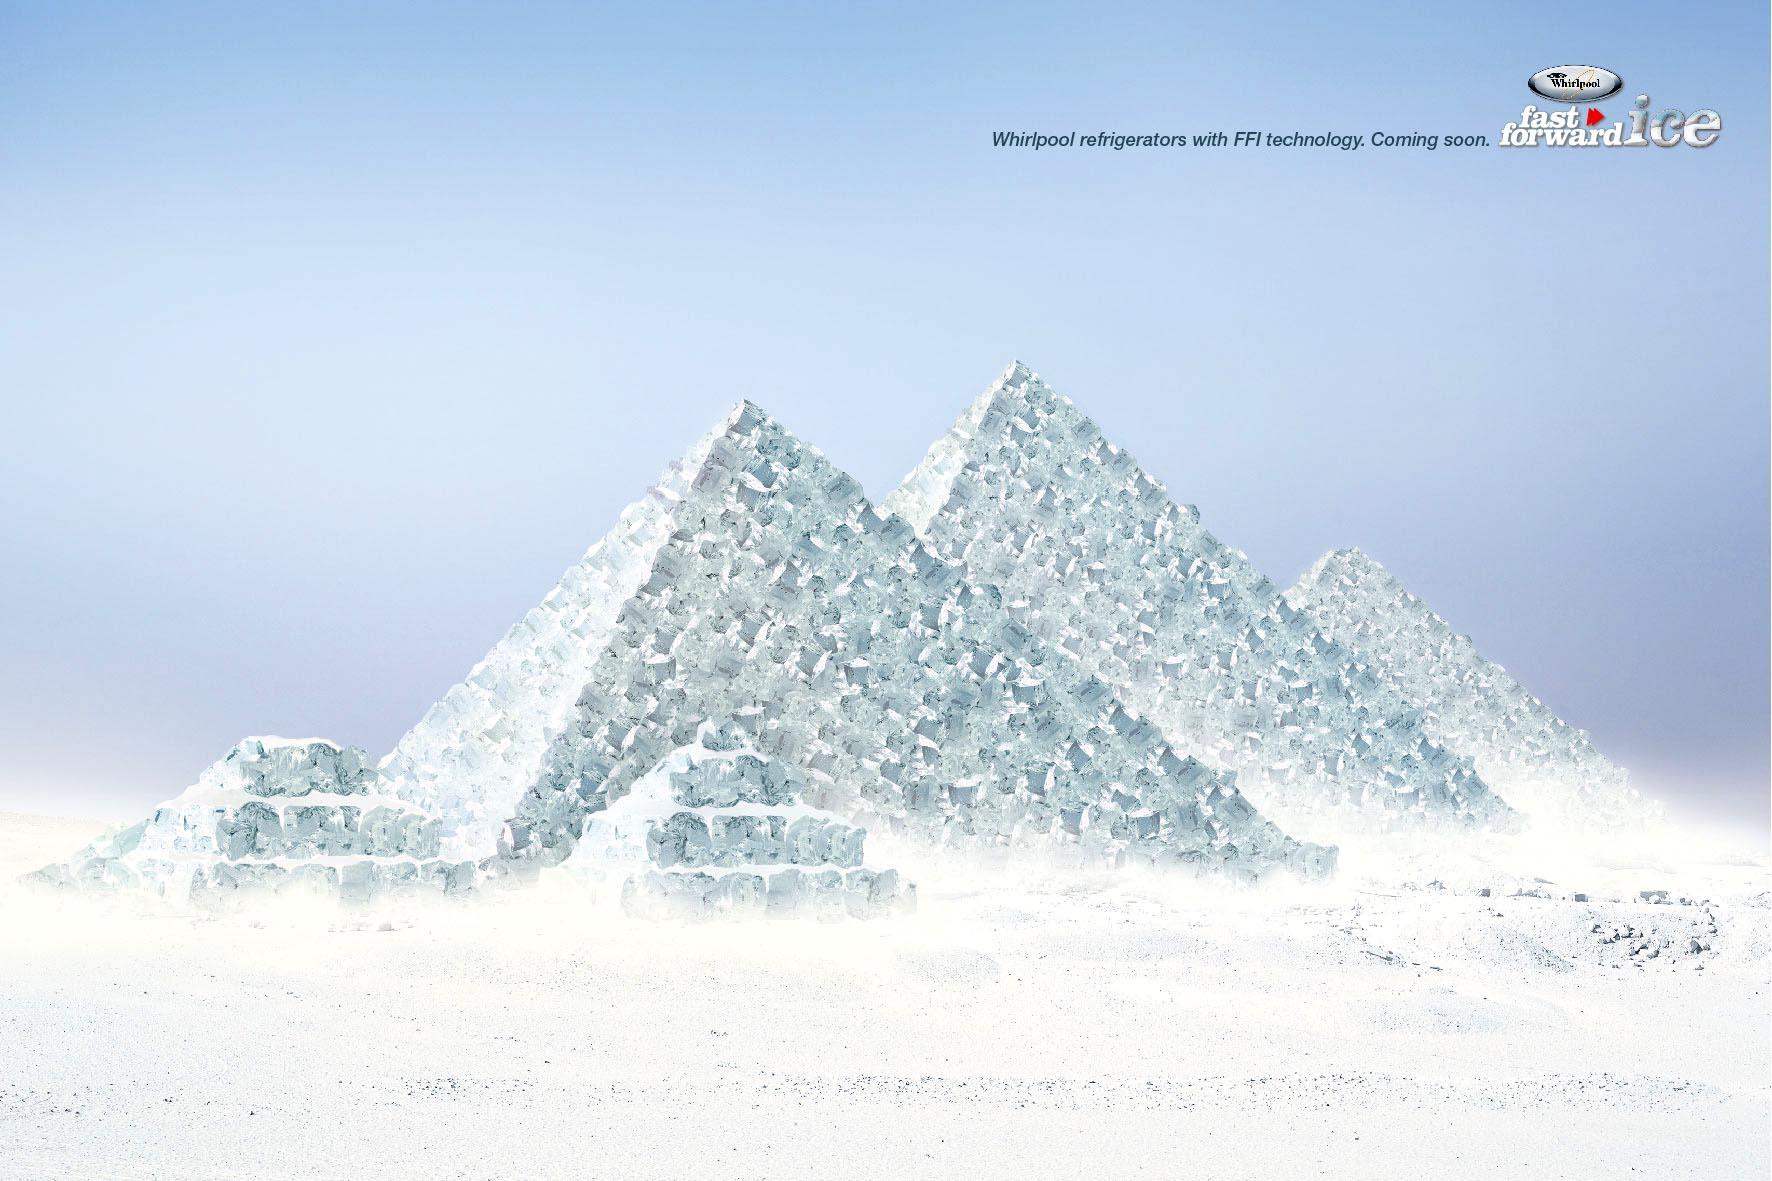 Whirlpool Refrigerators Fast Forward Ice